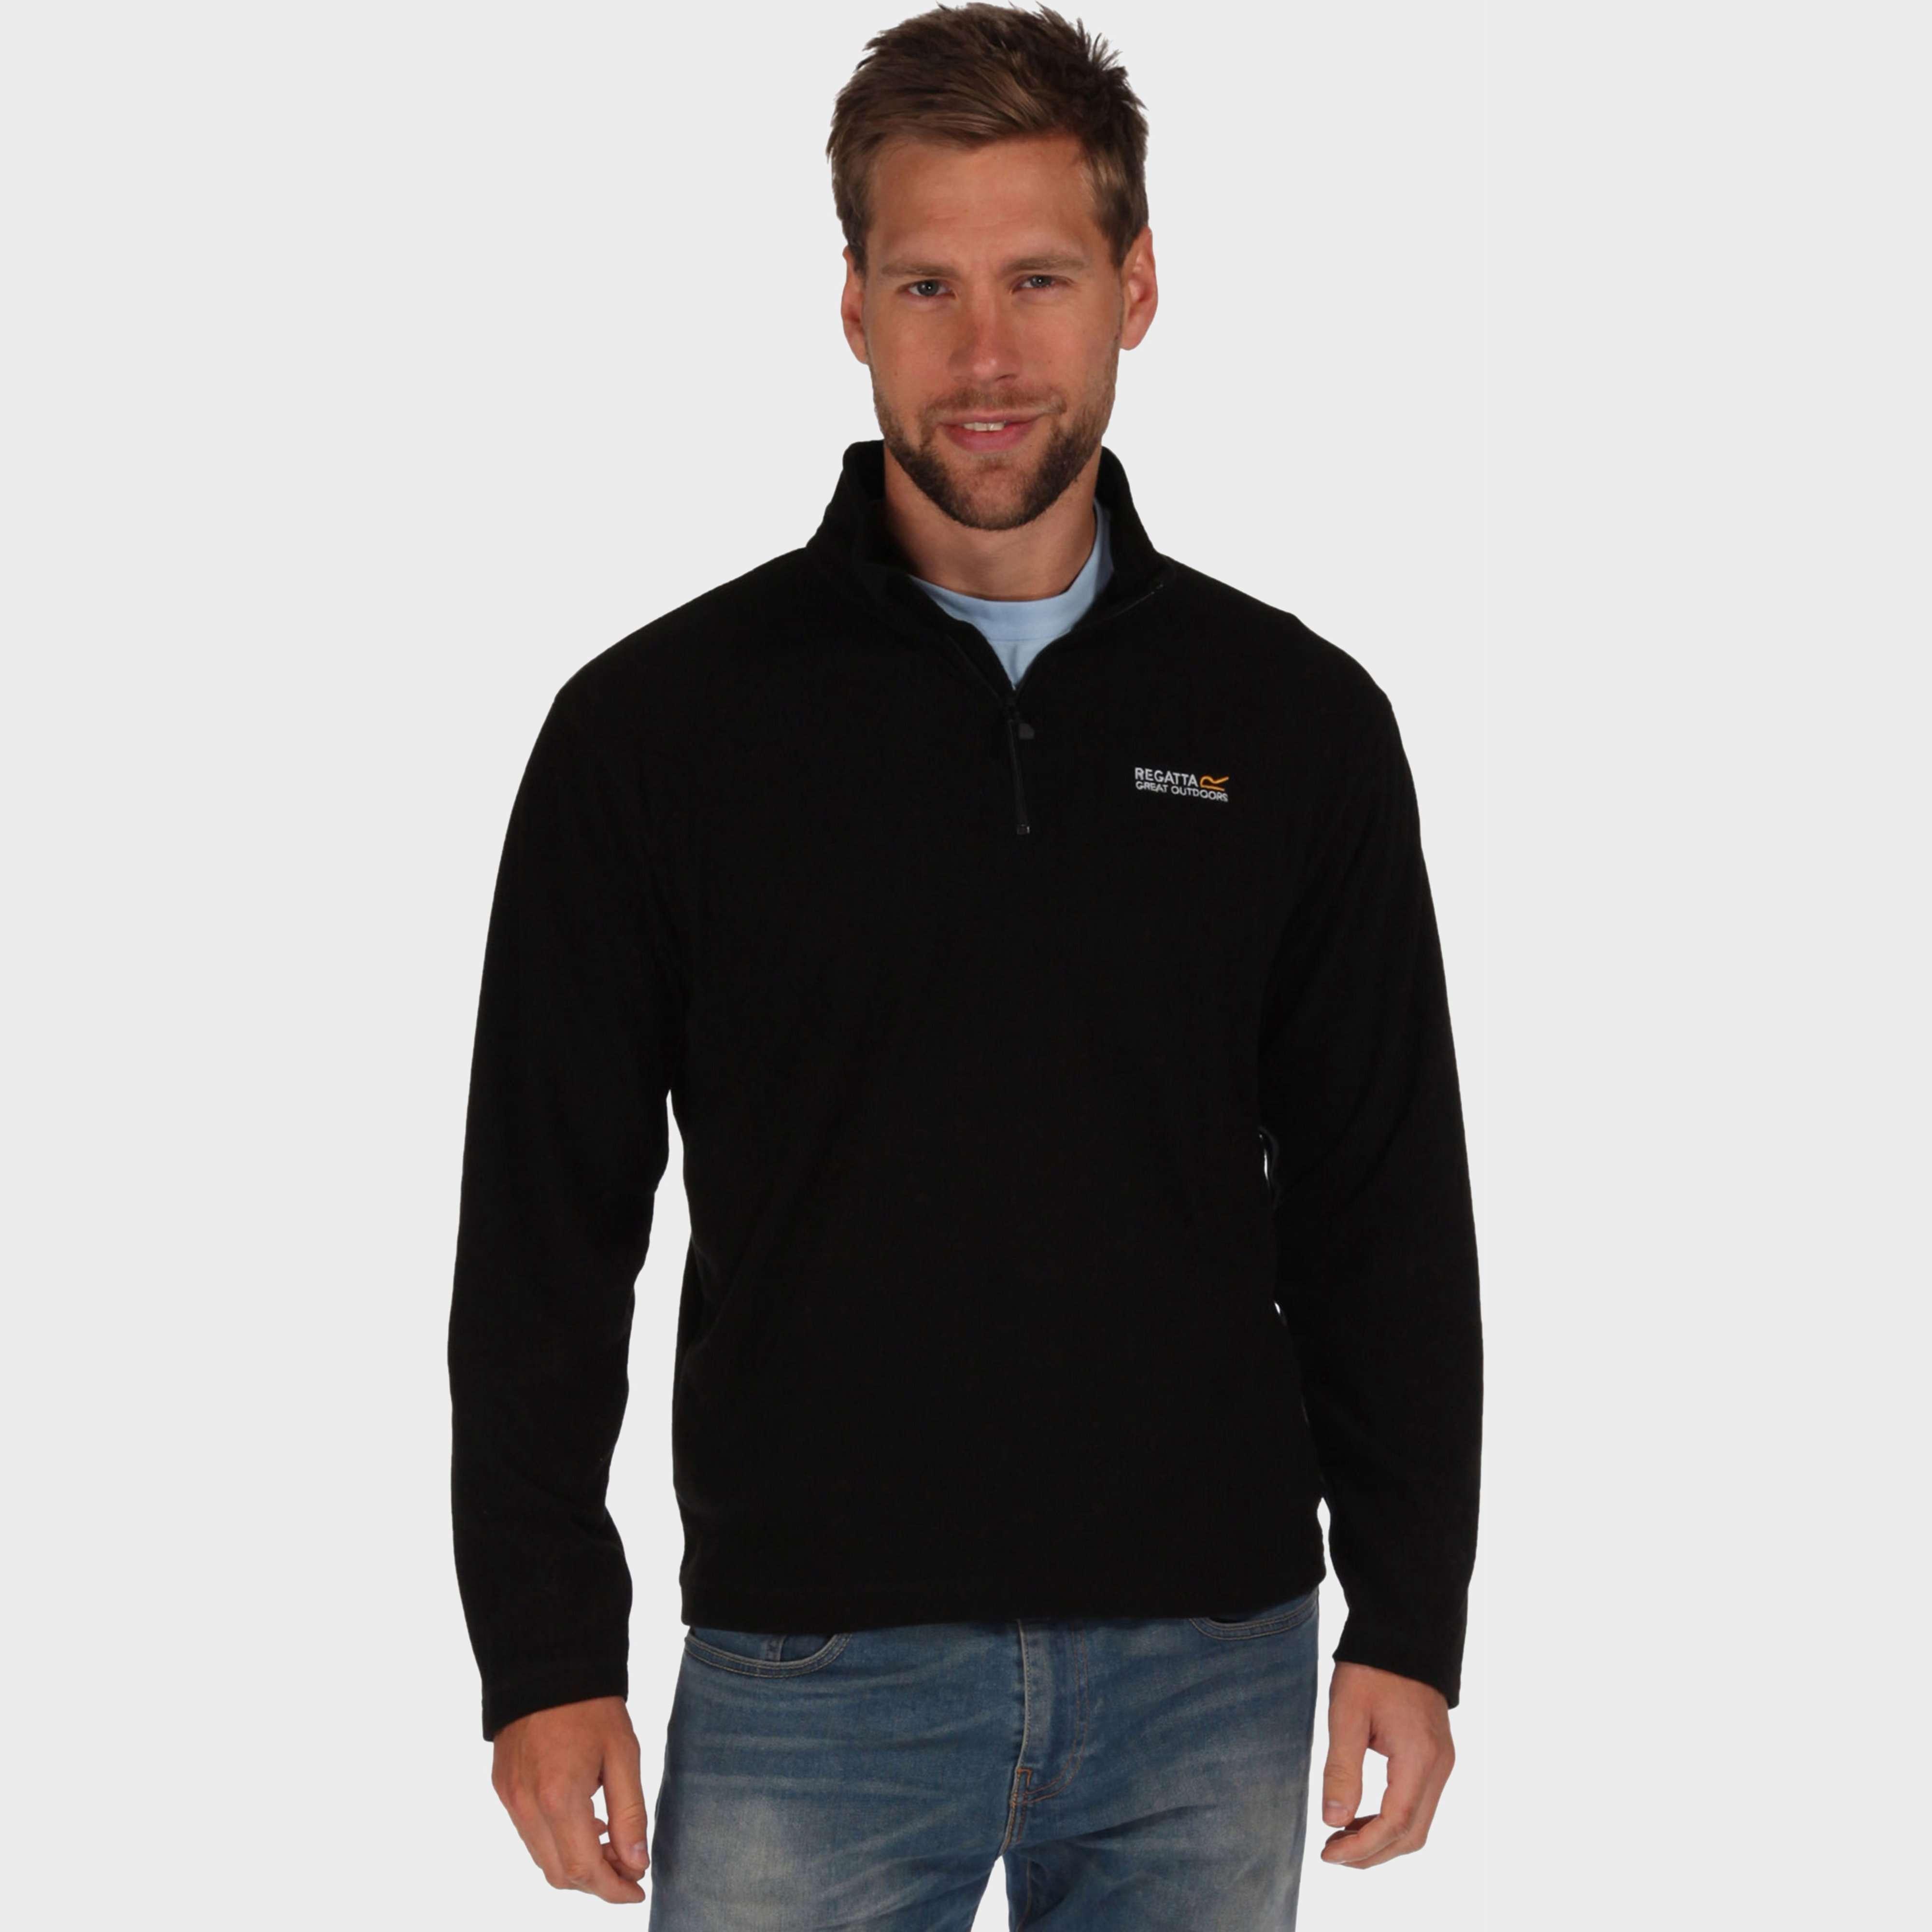 REGATTA Men's Thompson Half Zip Fleece